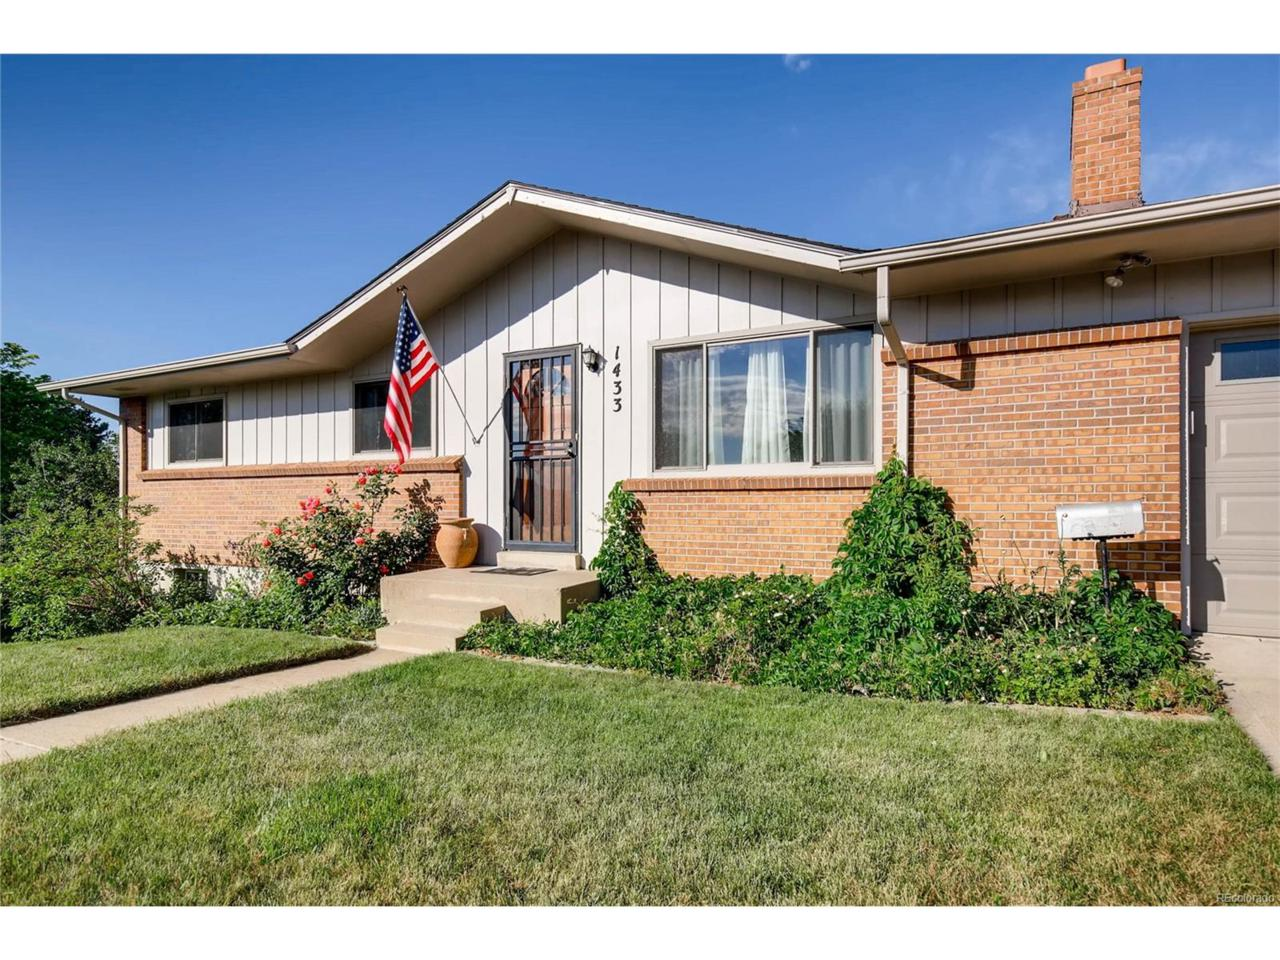 1433 S Vivian Way, Lakewood, CO 80228 (MLS #8953692) :: 8z Real Estate